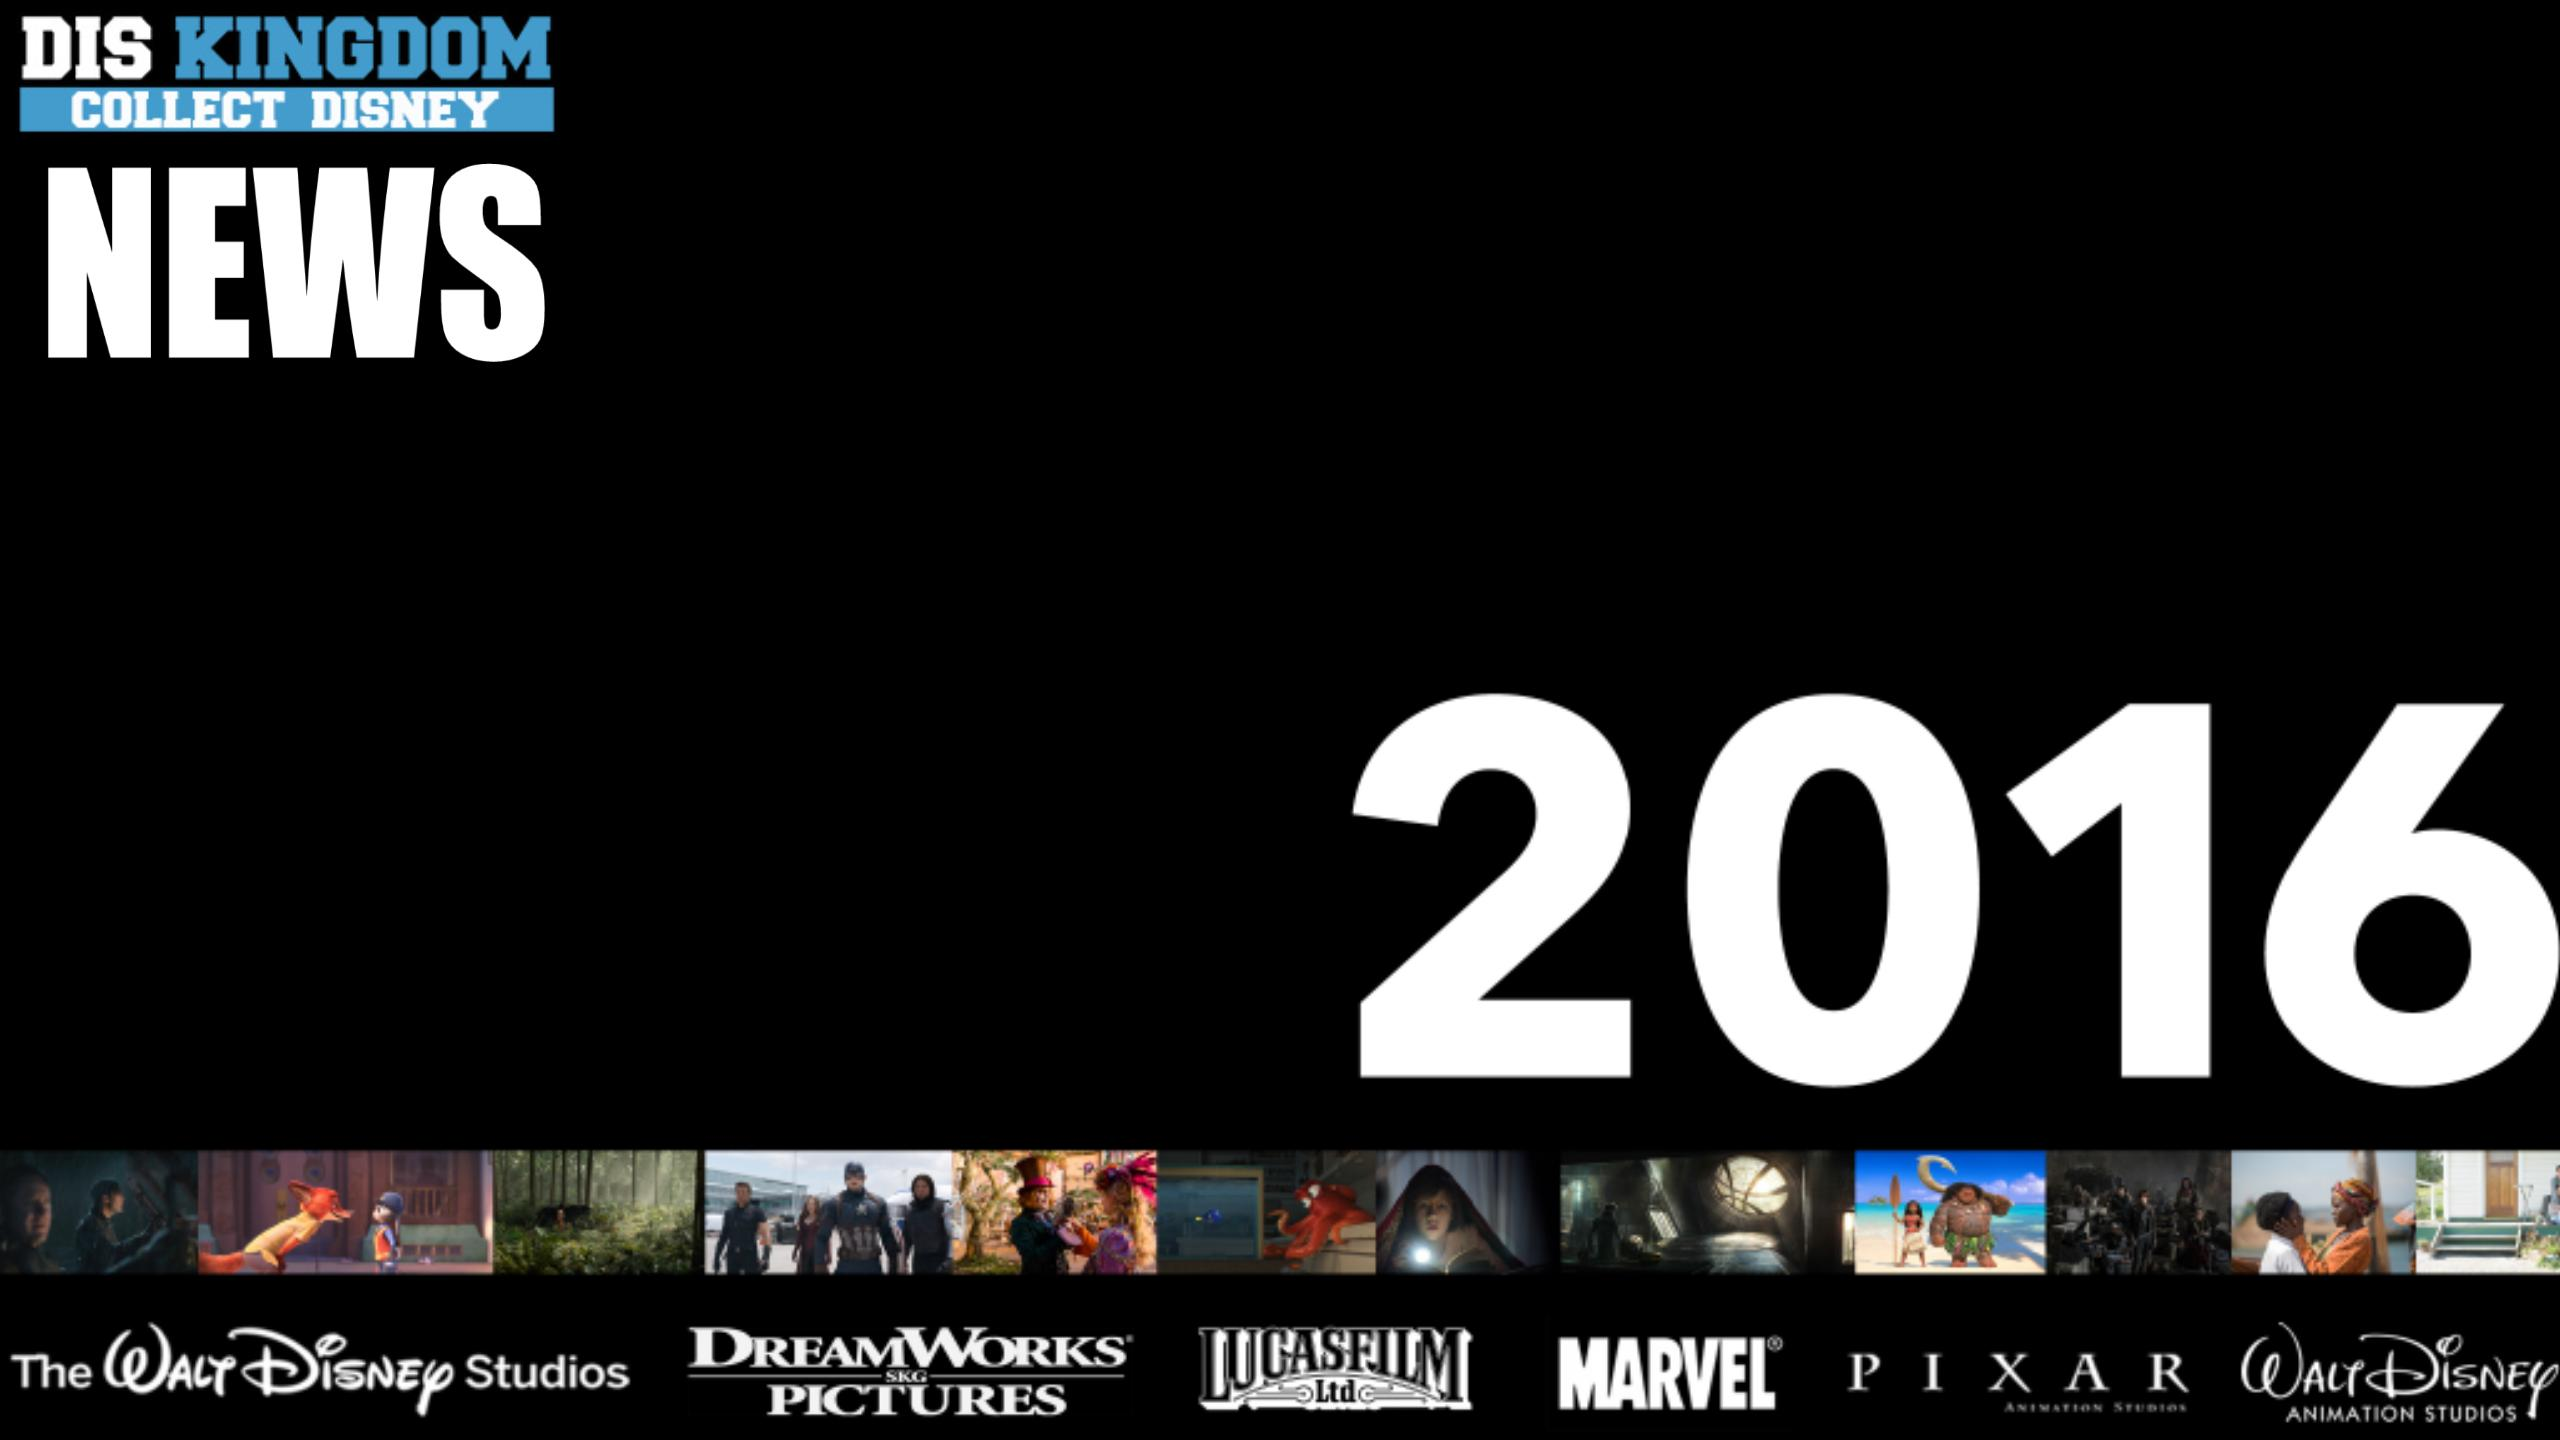 Disney's 2016 Movie Slate Features 13 Films